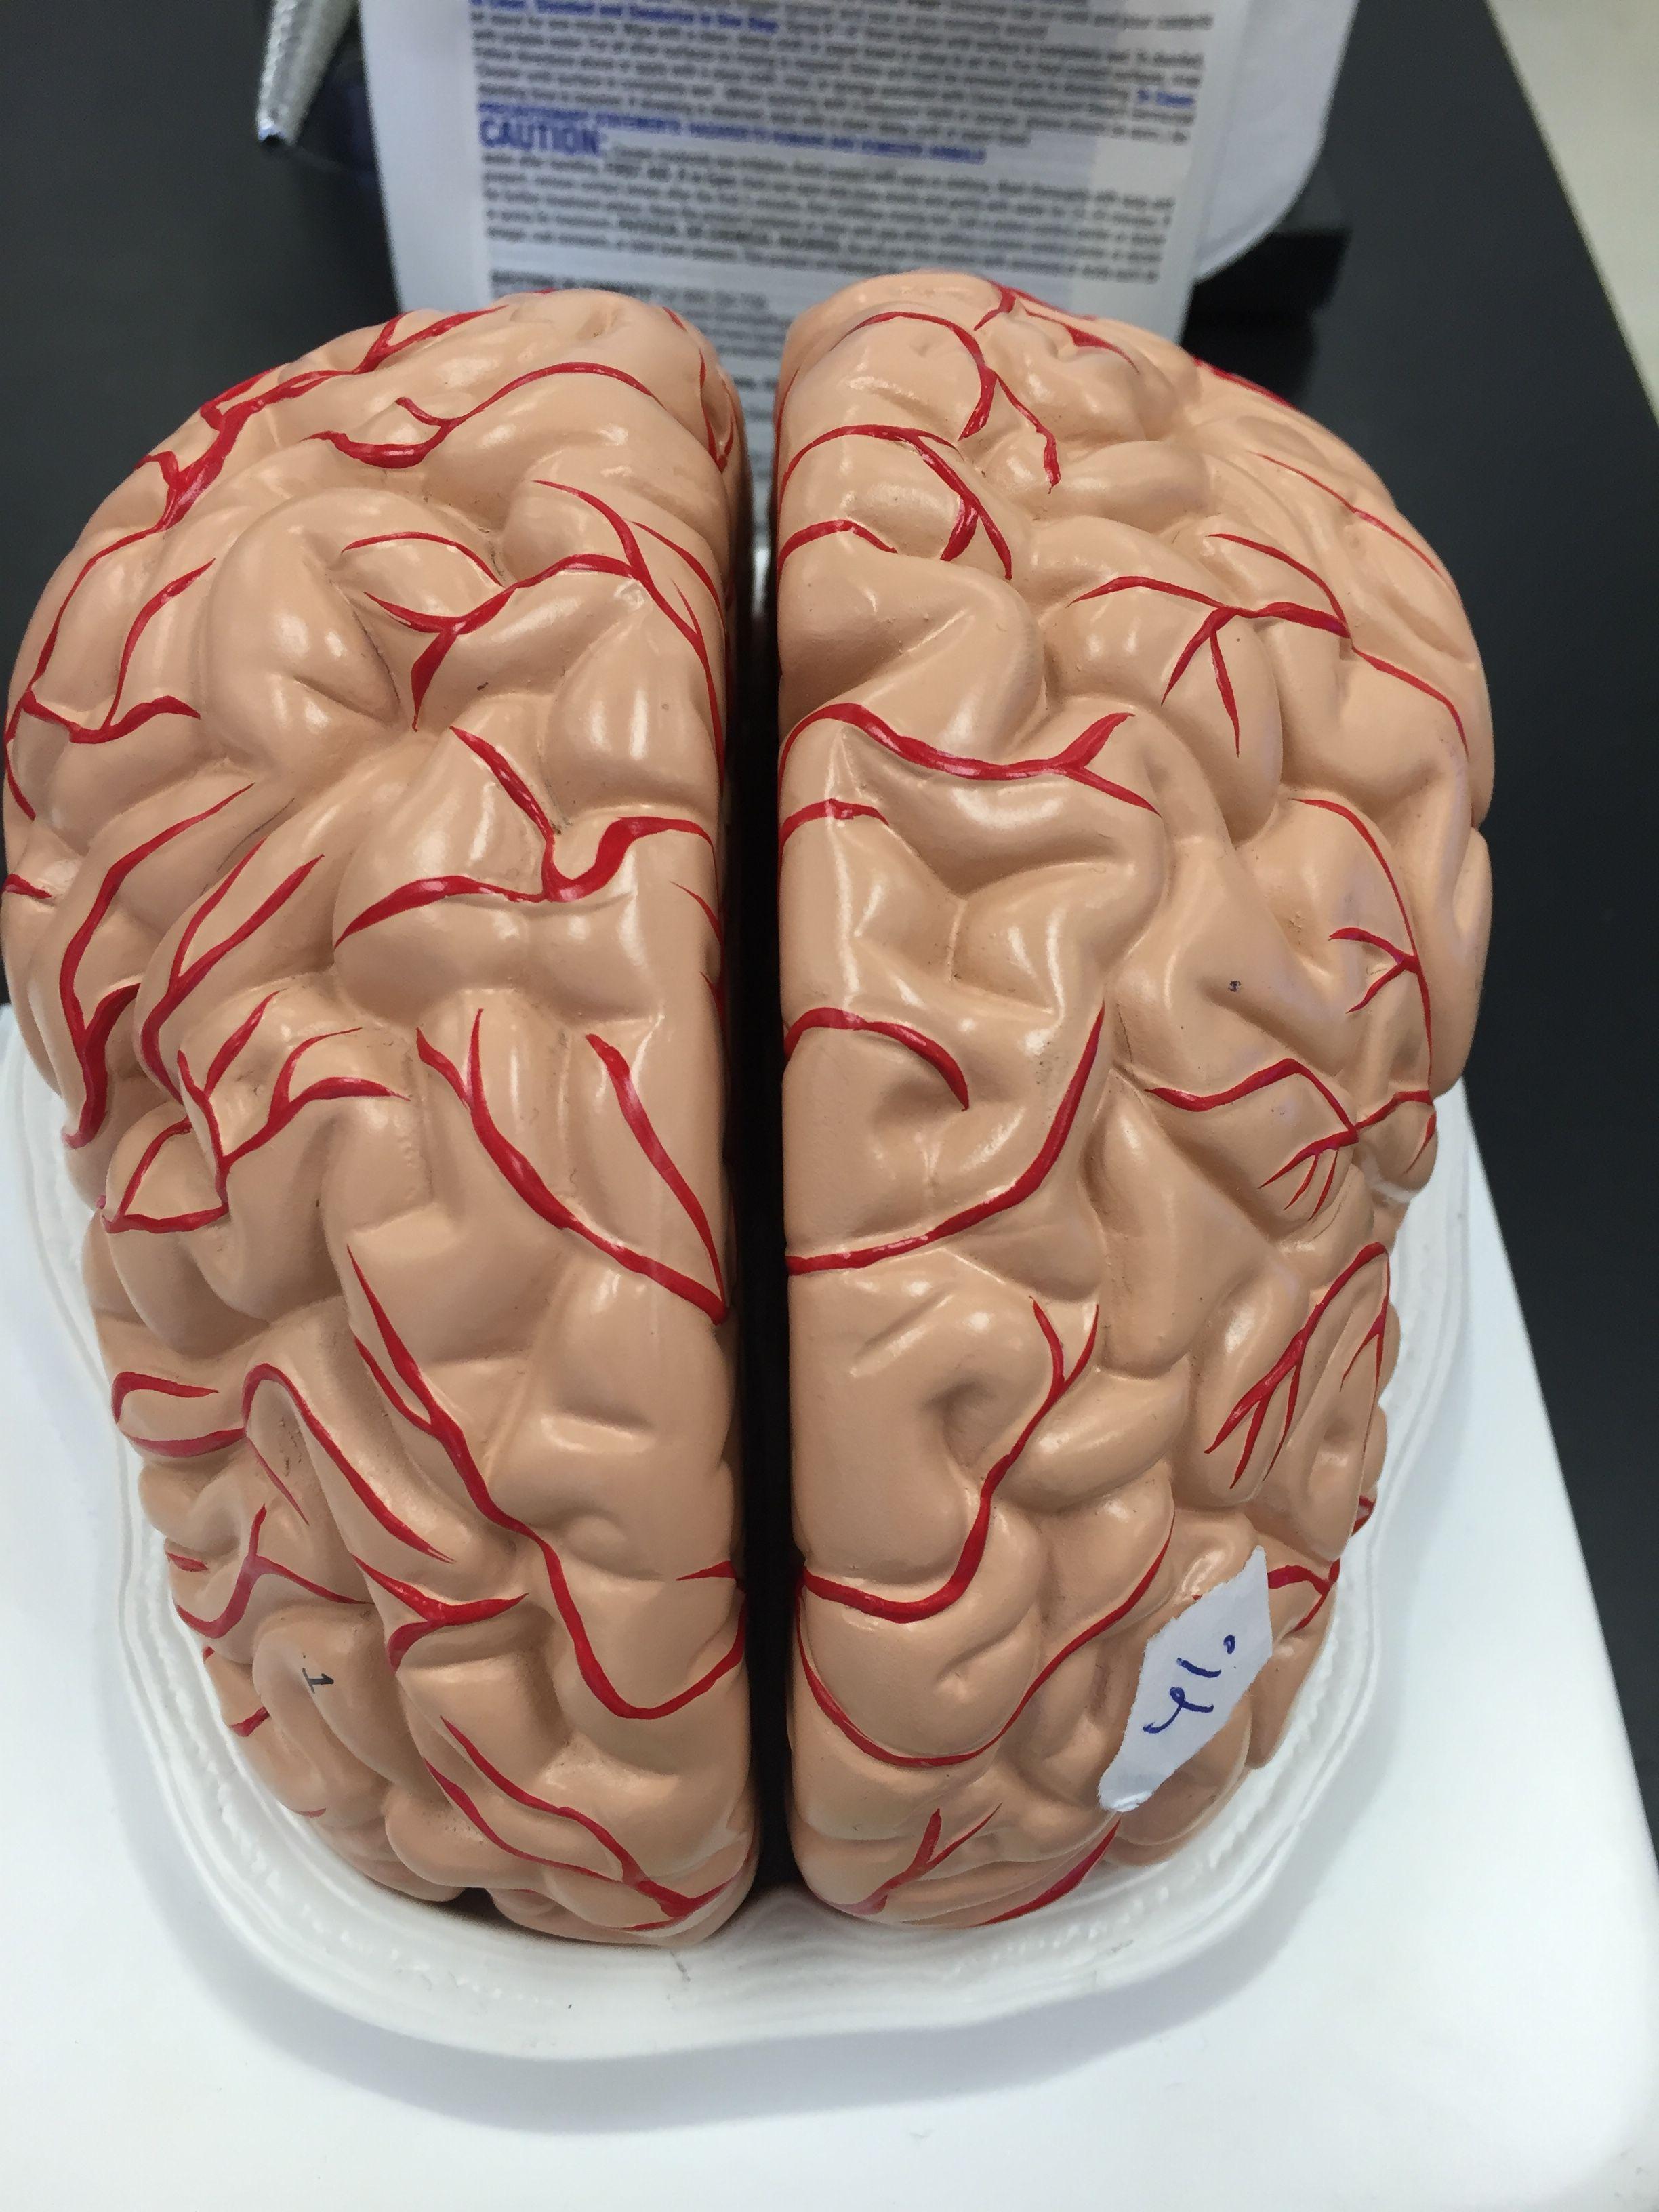 Frontal lobe of brain anatomy | Anatomy & Physiology | Pinterest ...